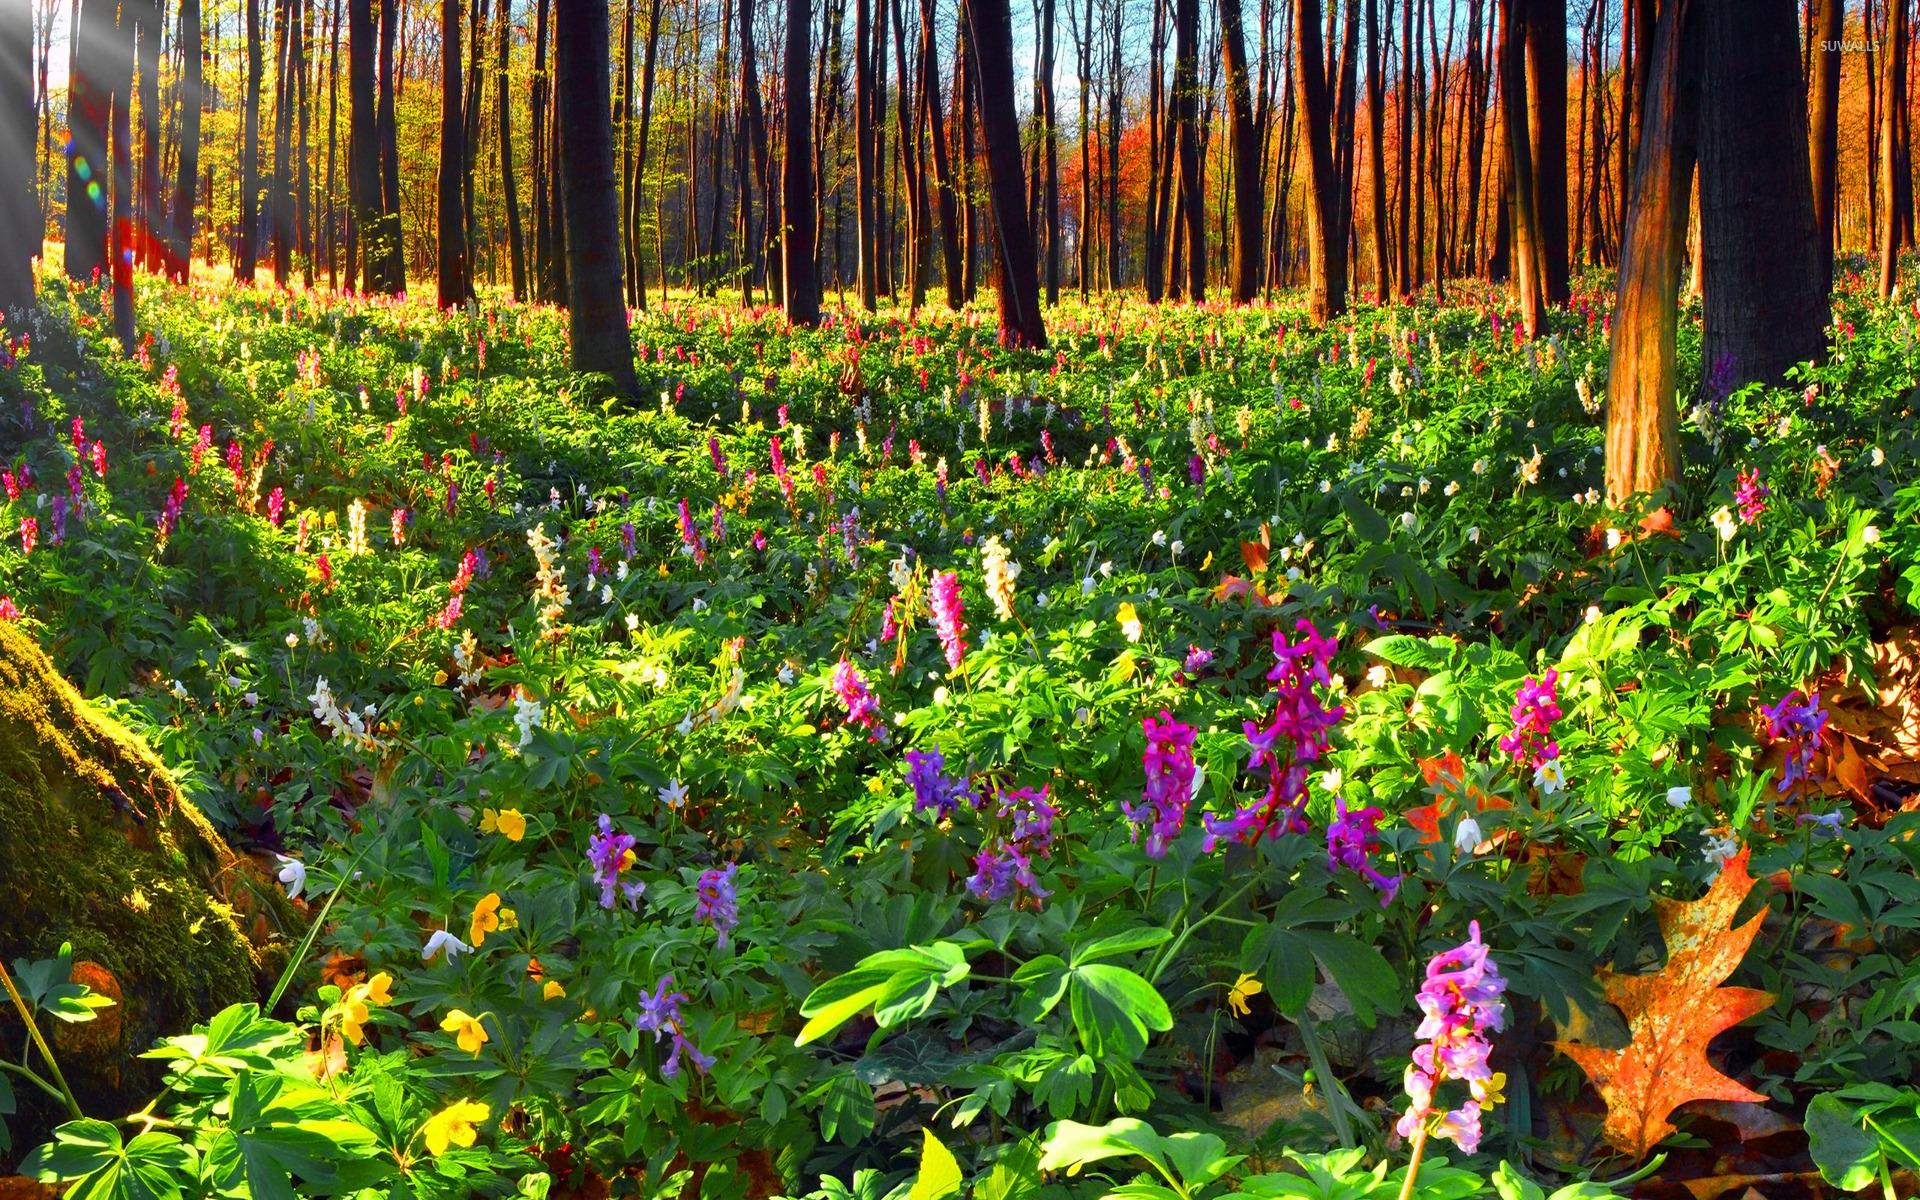 Summer Flowers In The Forest Wallpaper 1920x1200 Jpg